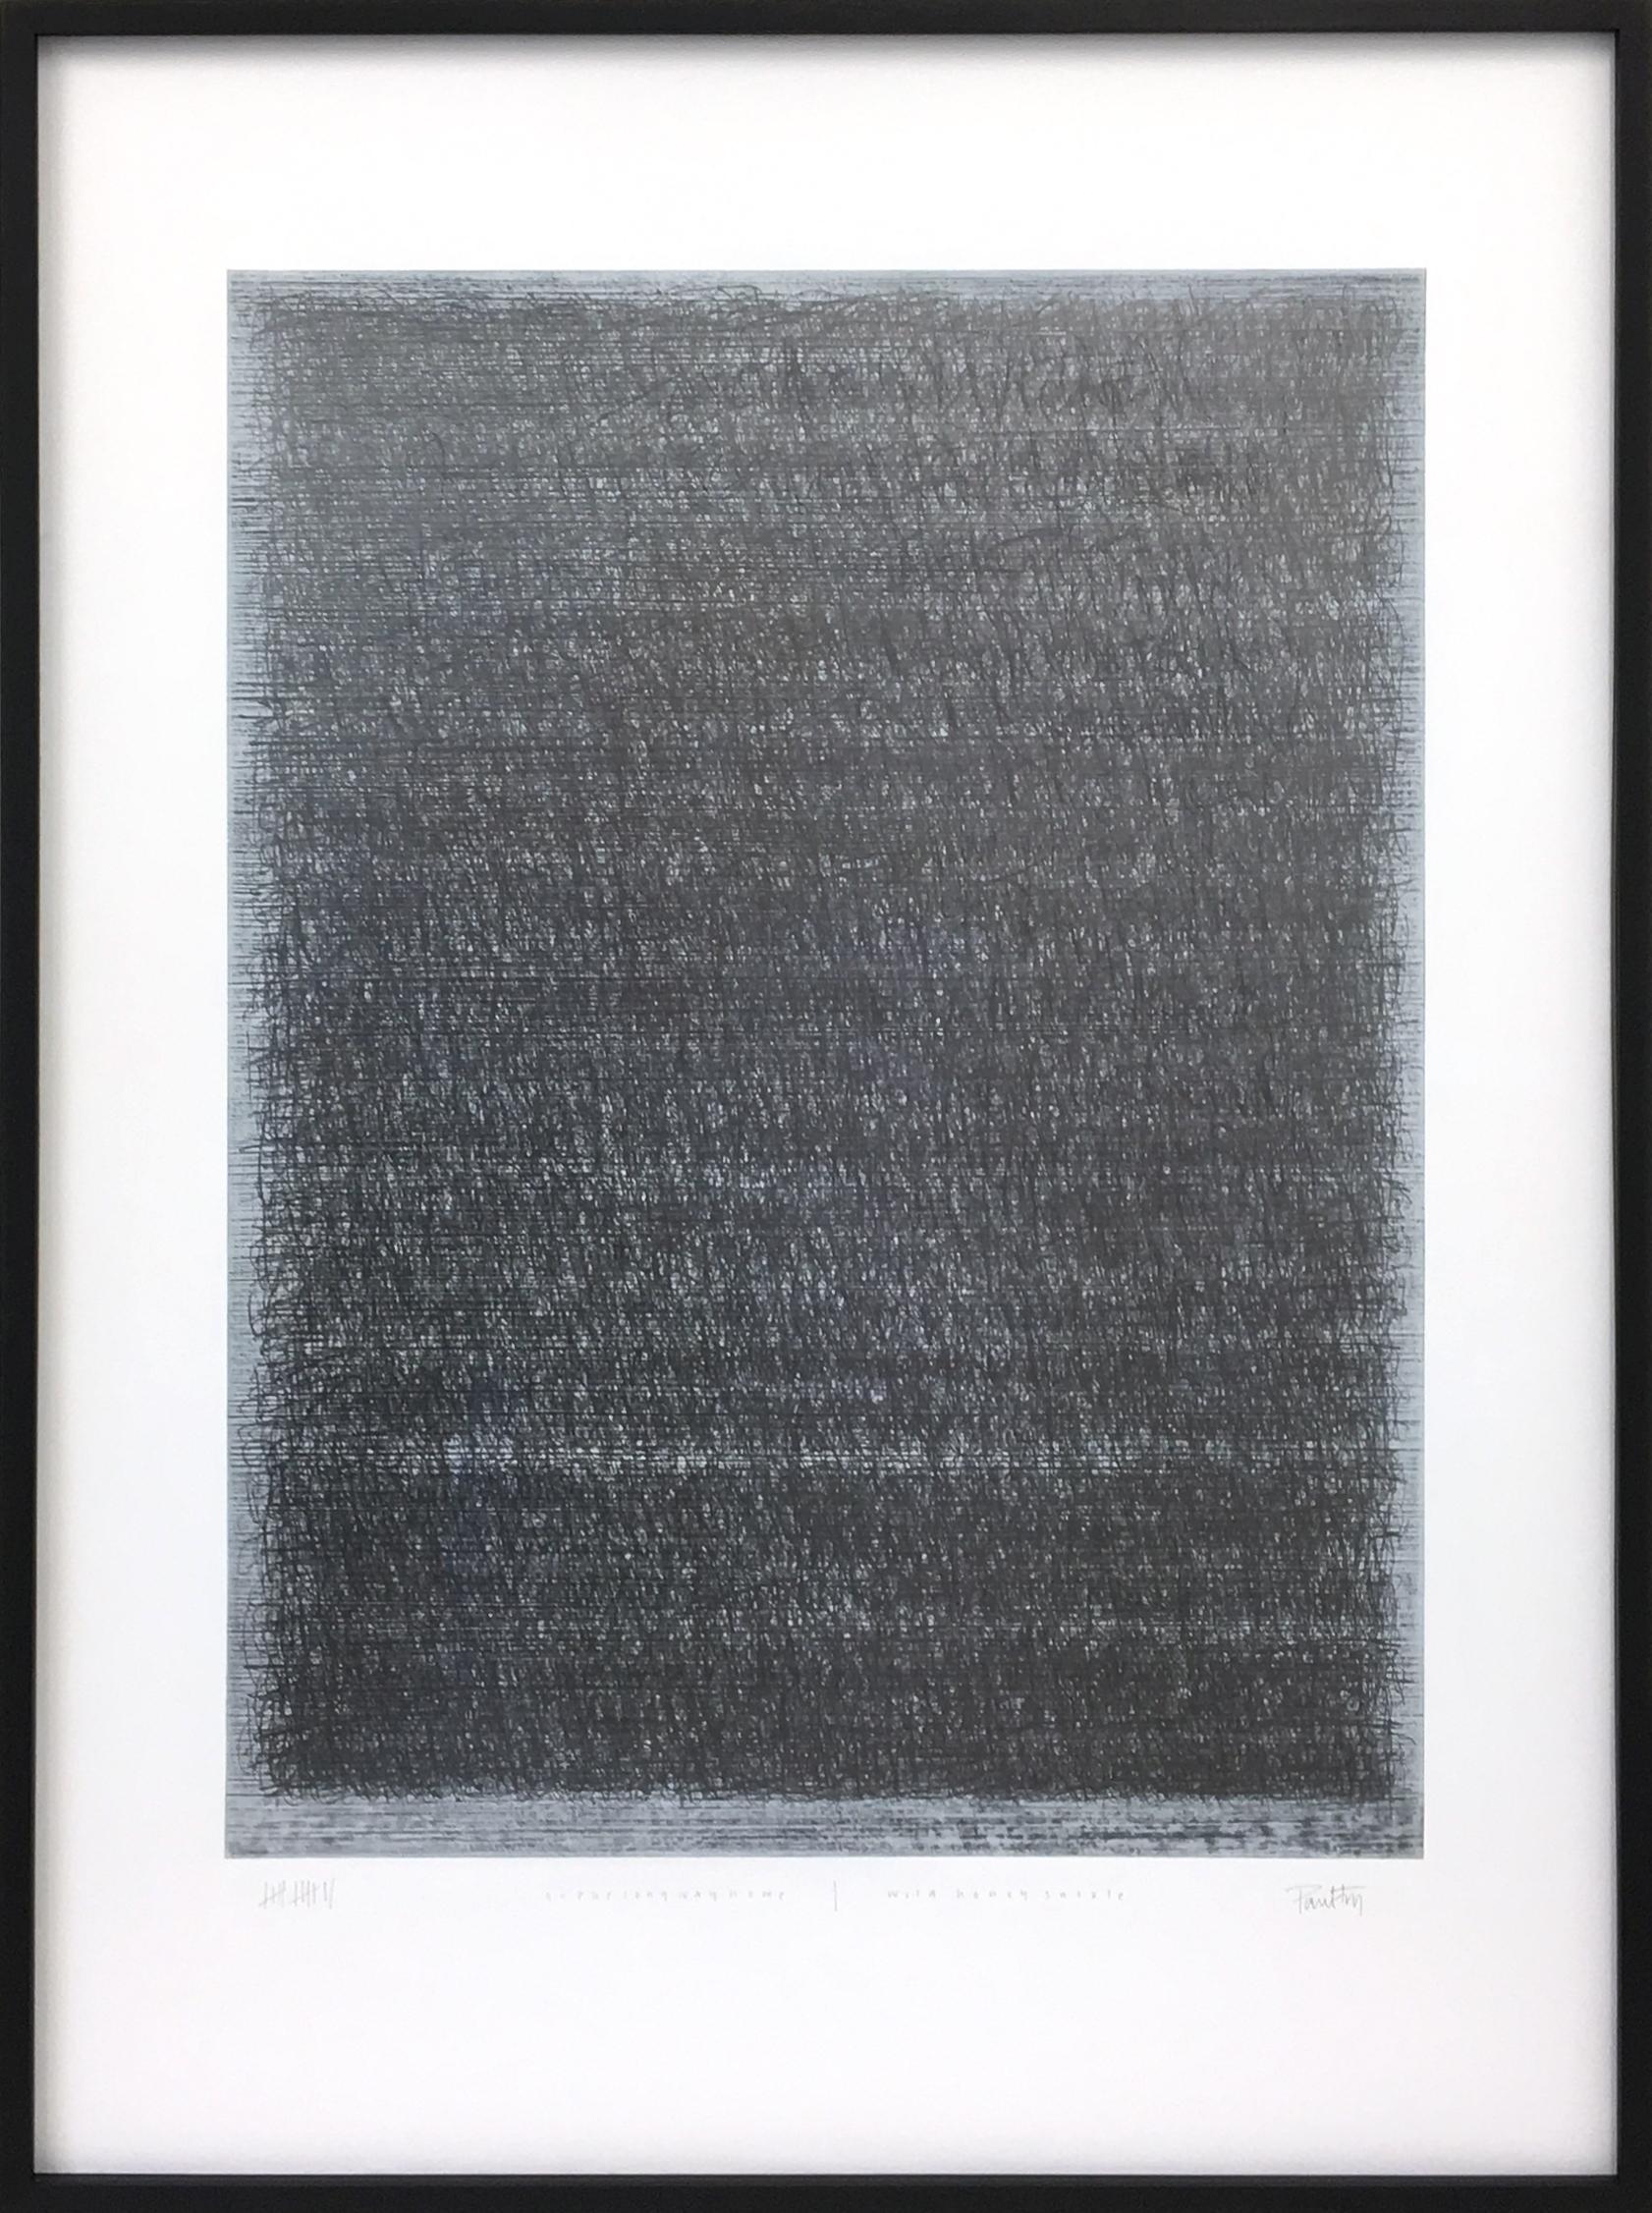 Paul Fry Go the long way home | wild honeysuckle 105 x 137 x 4.5 cm oil, gouache and graphite on canvas S O L D